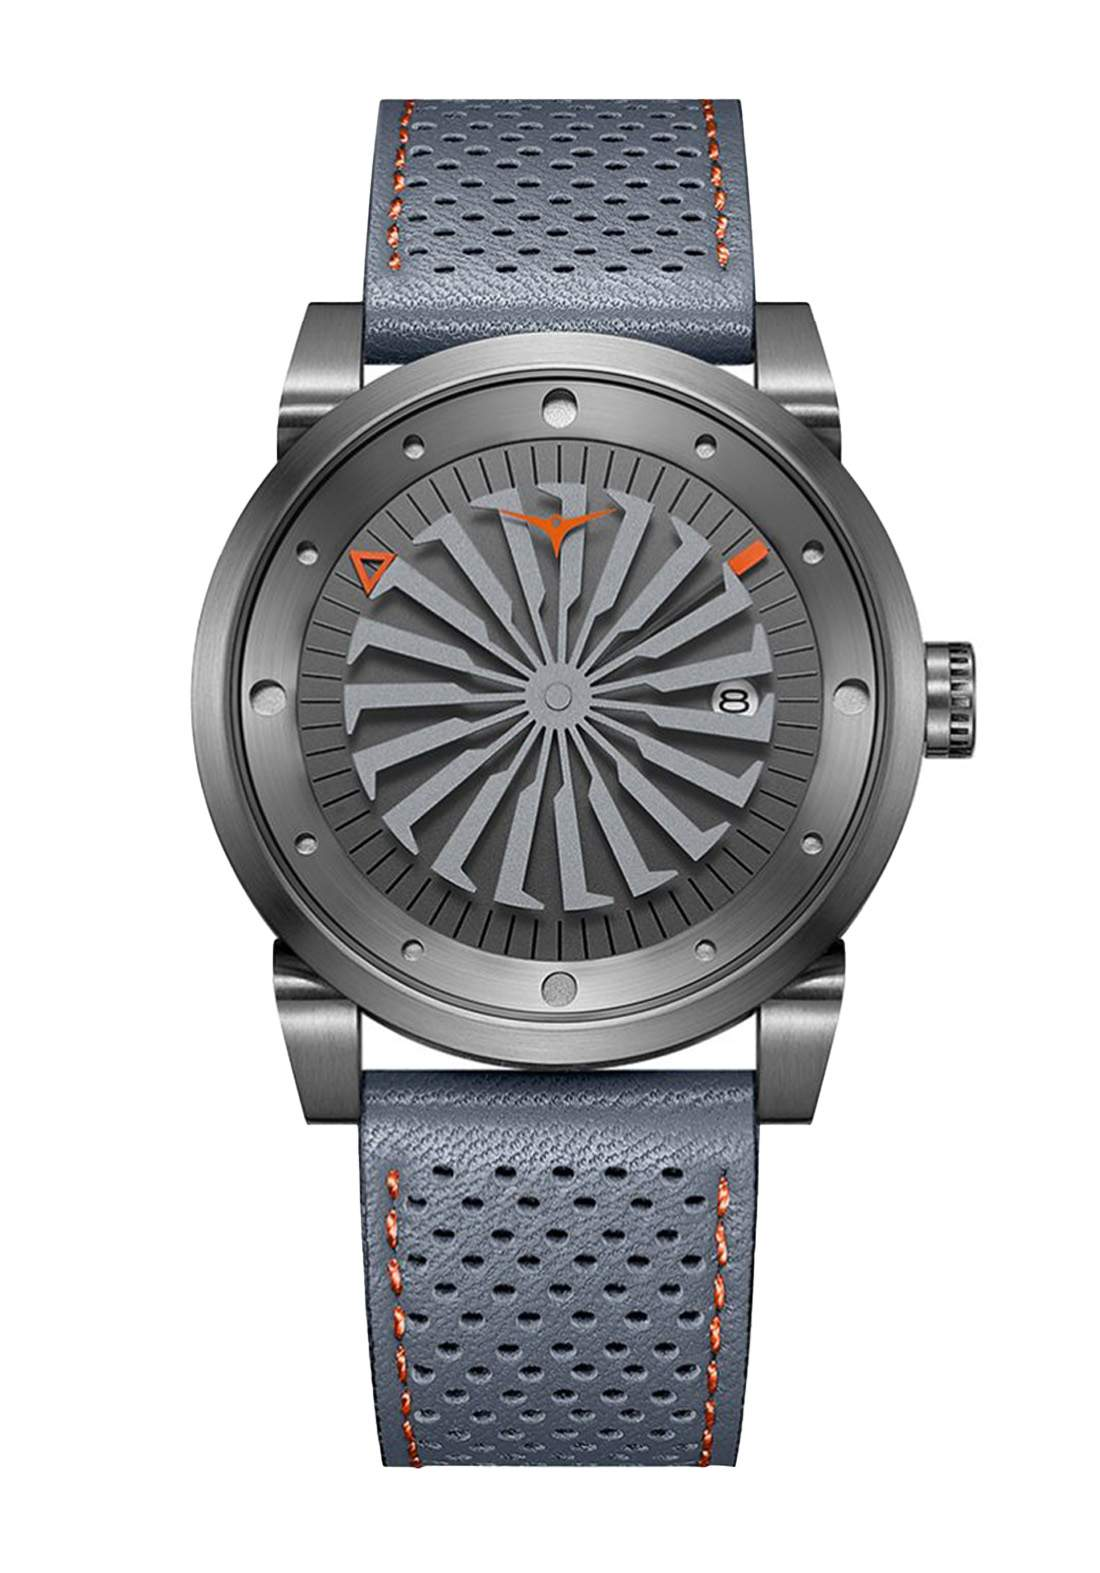 Zinvo Rival Ethos Watch For Men - Gray ساعة رجالي